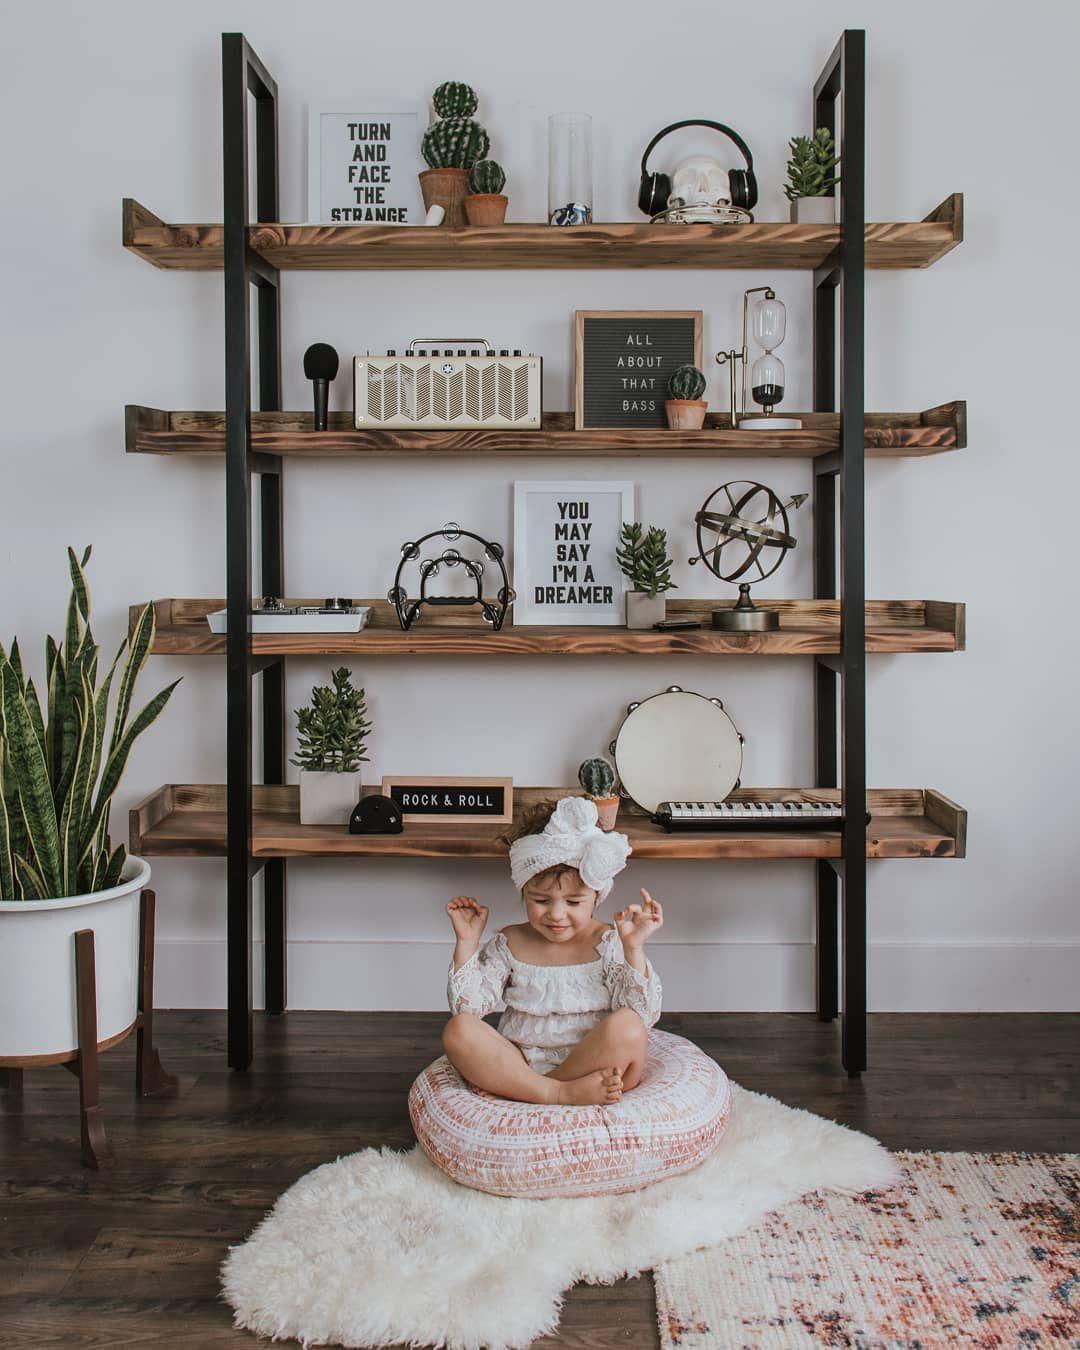 Melissa Mccoy On Instagram We Re Feeling Pretty Zen Over Here This Monday Morning I Ve Been Having So Muc Bookcase Diy Bookshelves Diy Industrial Bookcases